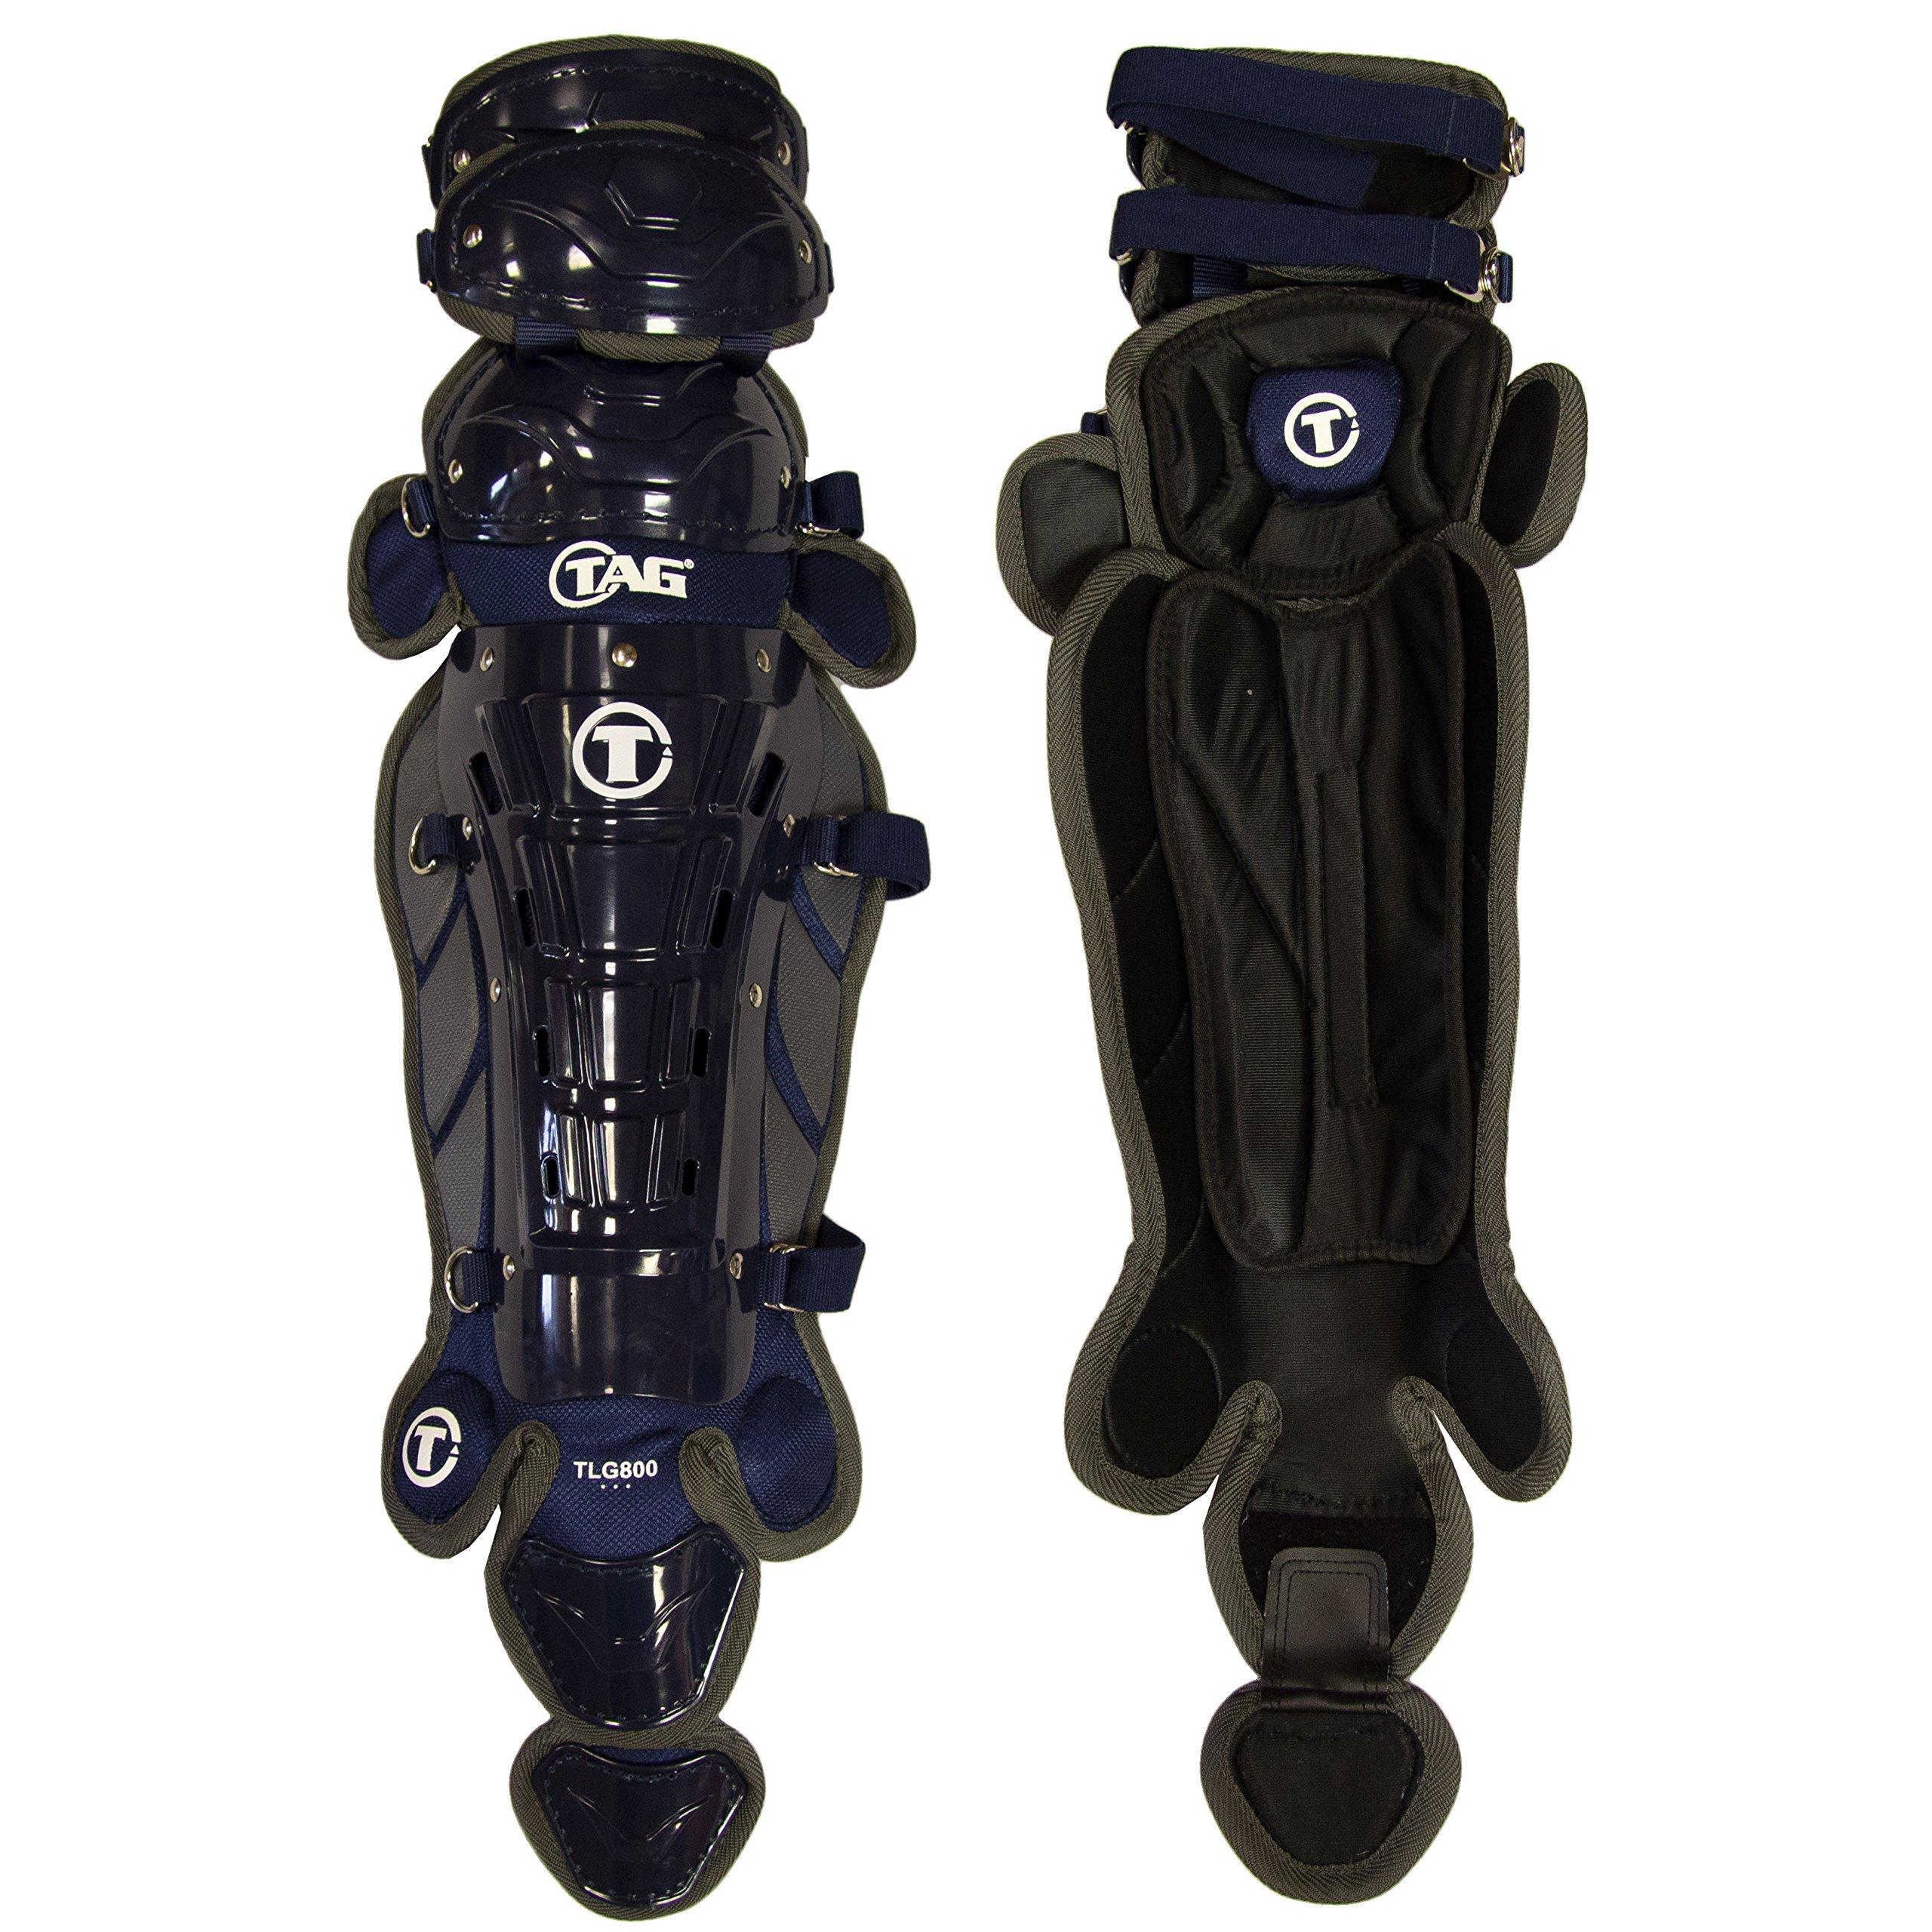 TAG 16'' Pro Series Women's Leg Guard, Navy/Grey by TAG